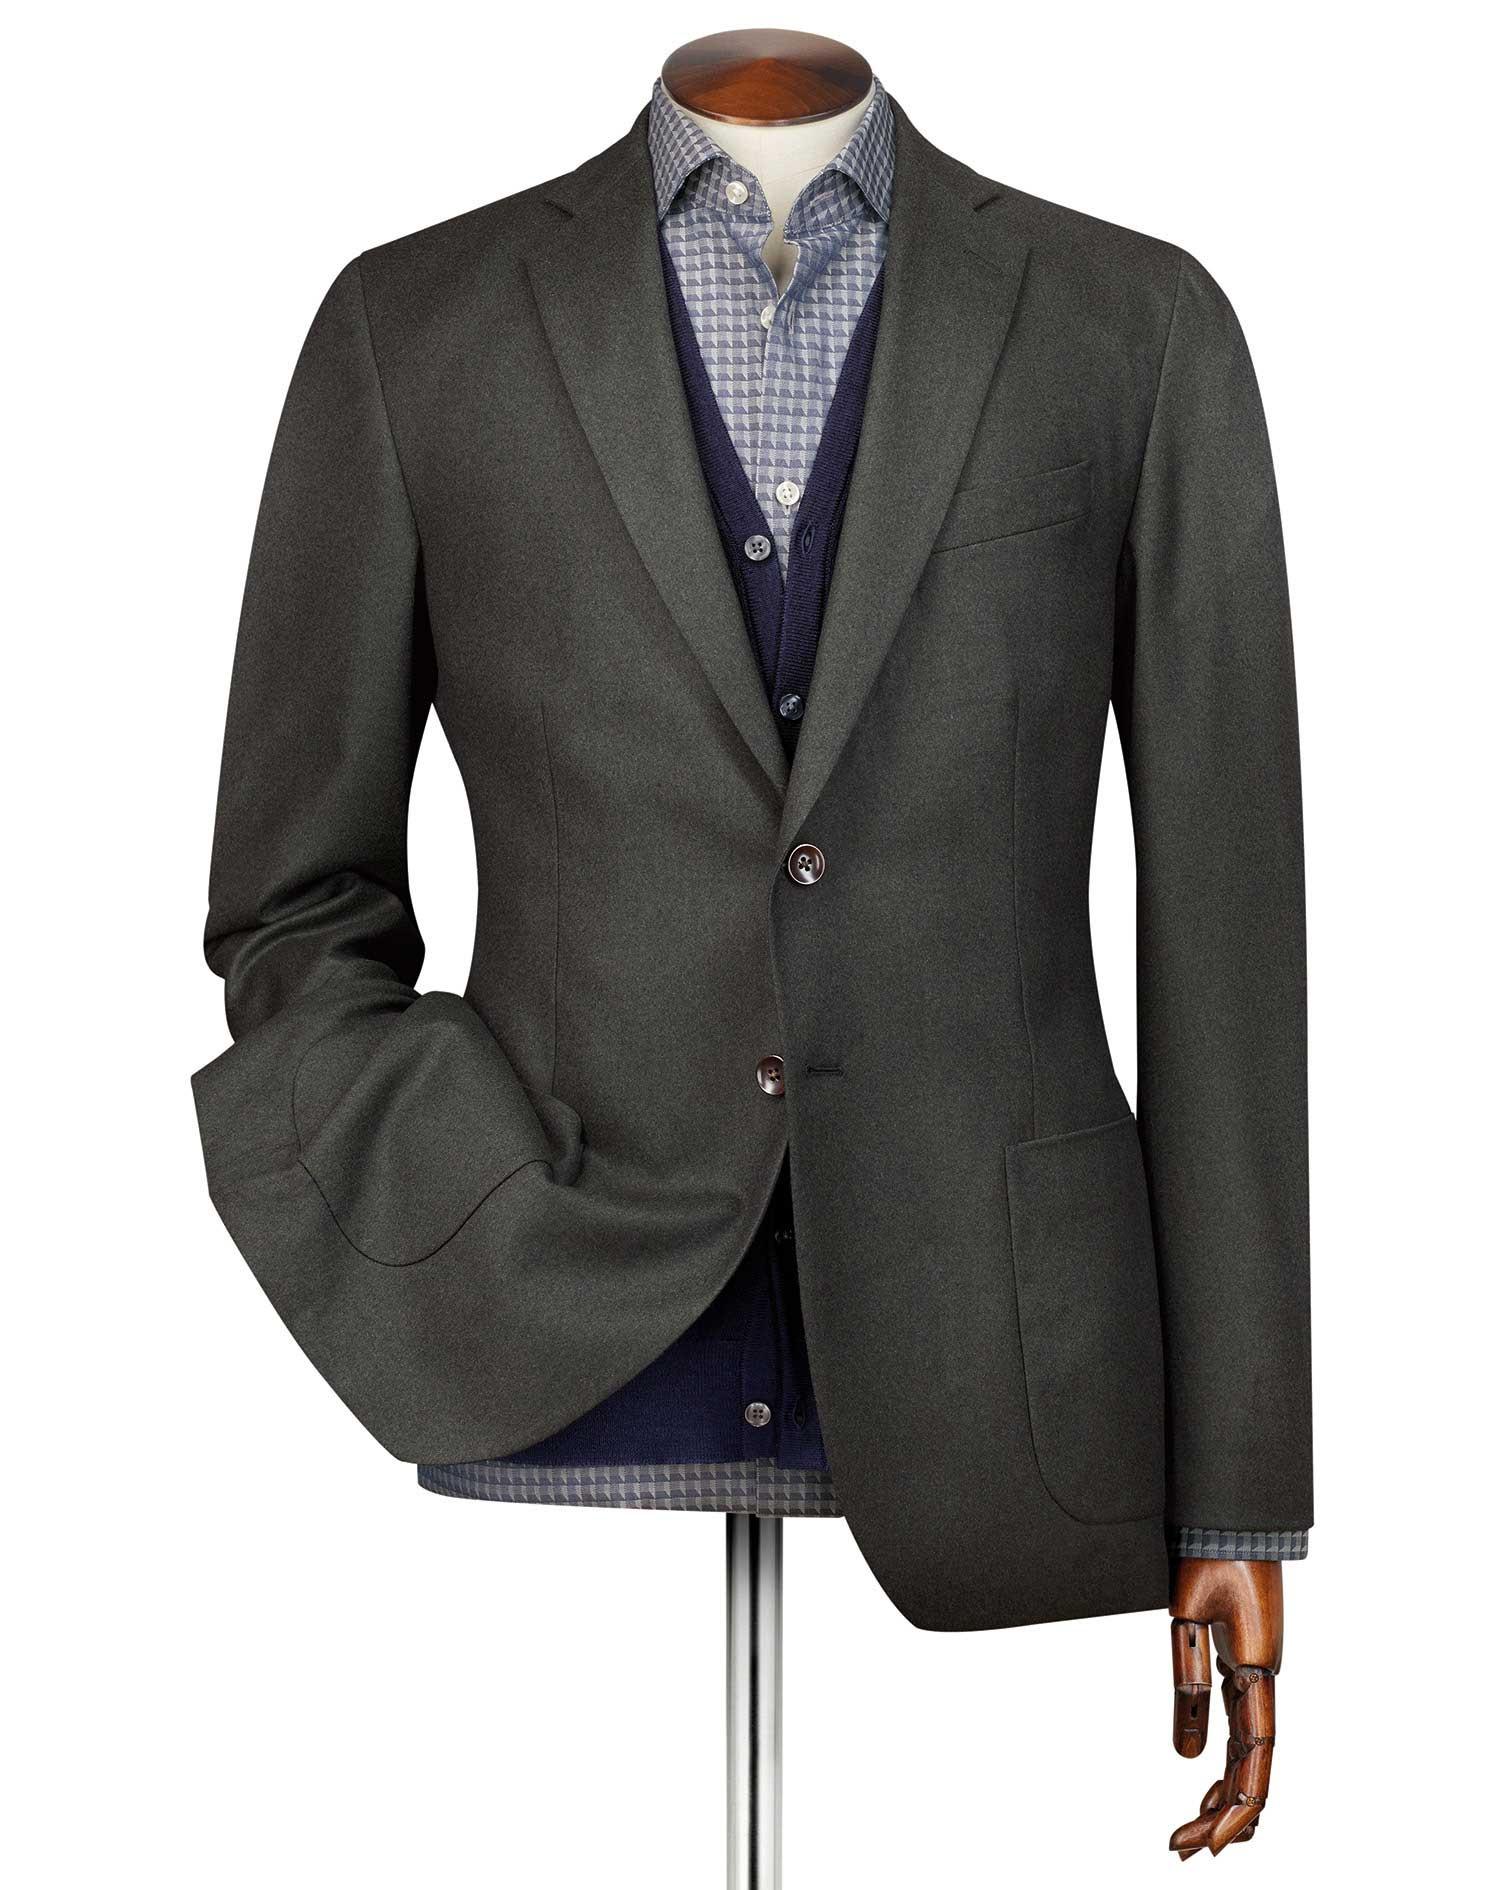 Slim Fit Green Plain Italian Wool Flannel Jacket Size 38 Regular by Charles Tyrwhitt